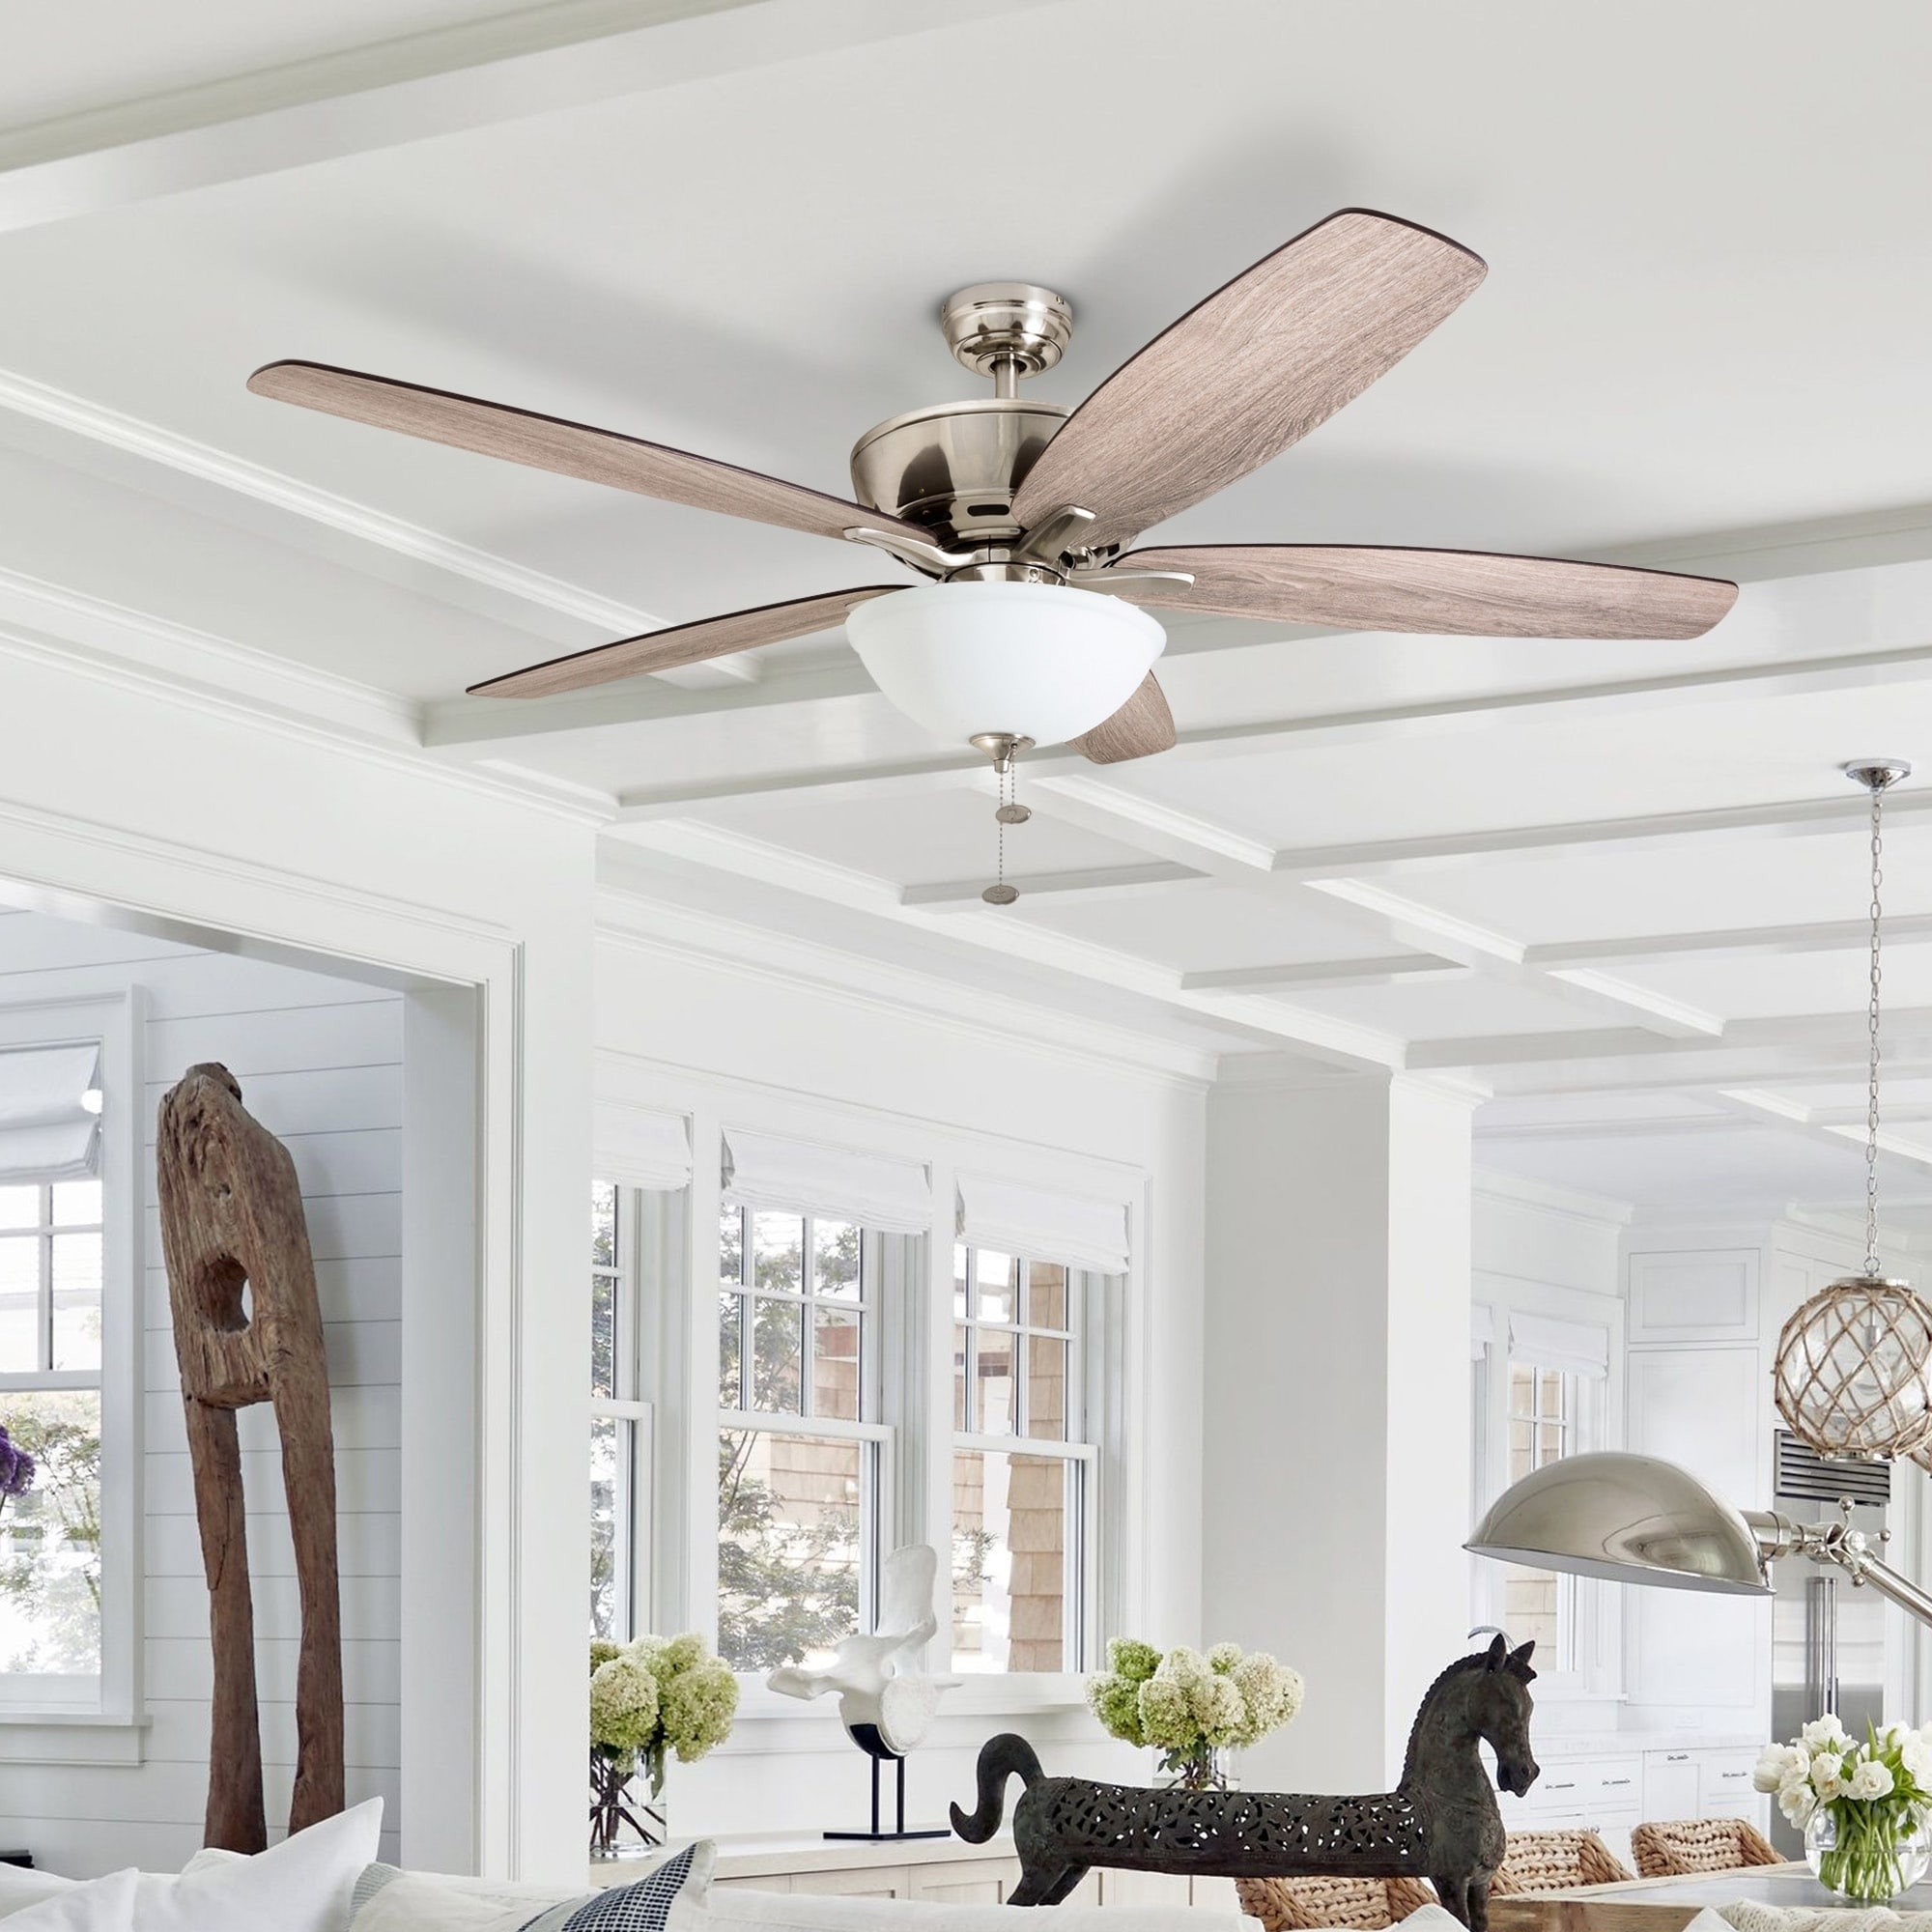 Denon Large Great Room Ceiling Fan